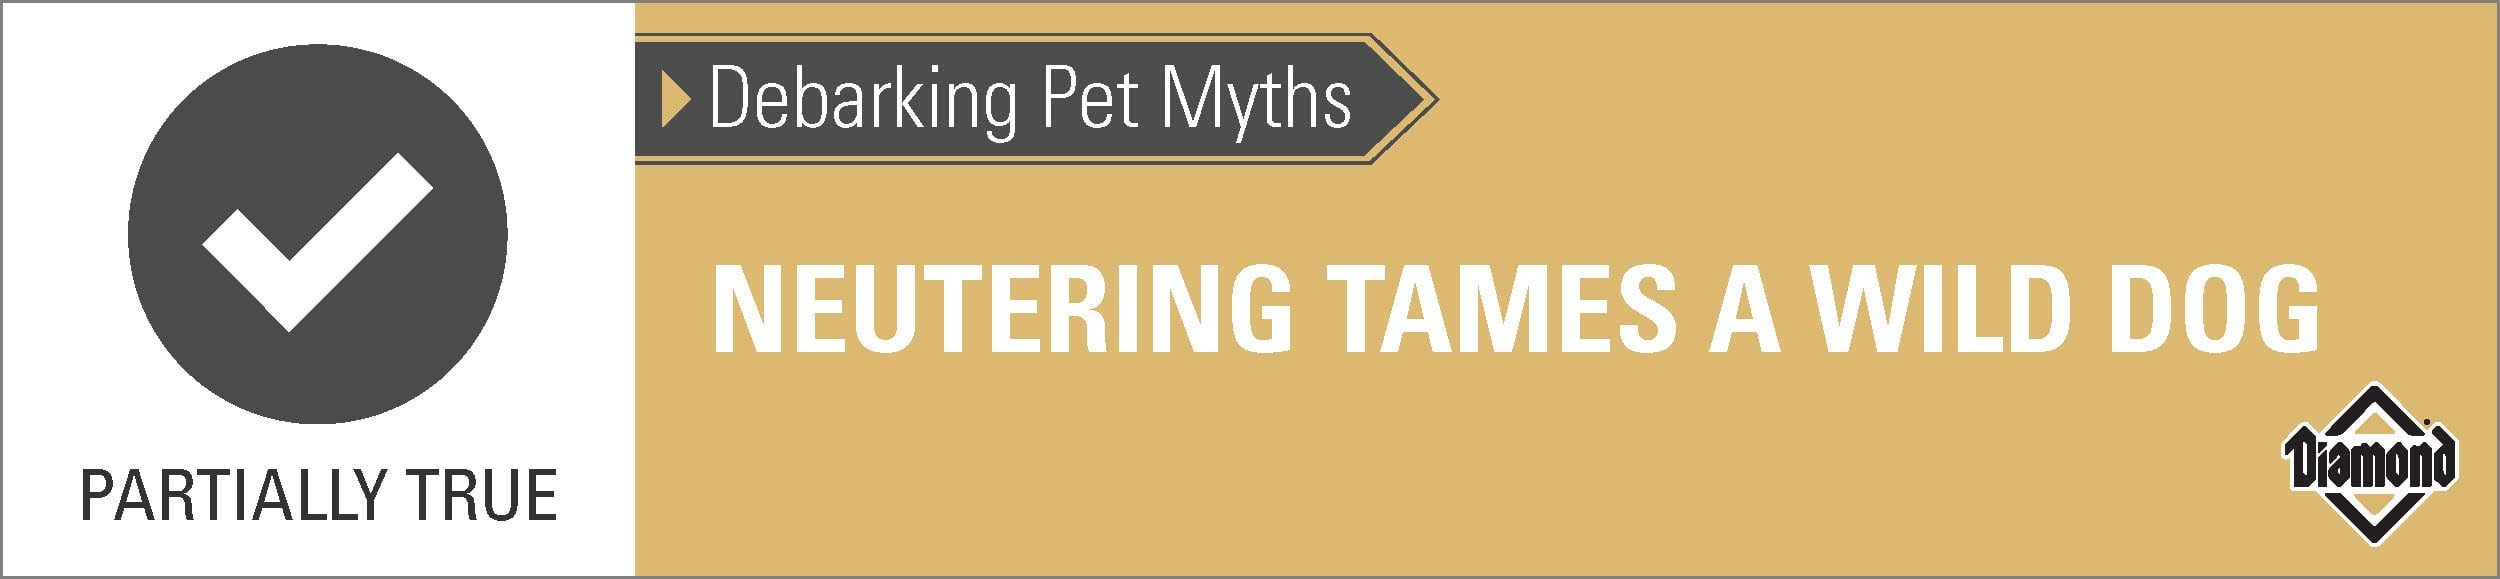 Partially True: Neutering Tames a Wild Dog | Diamond Pet Foods